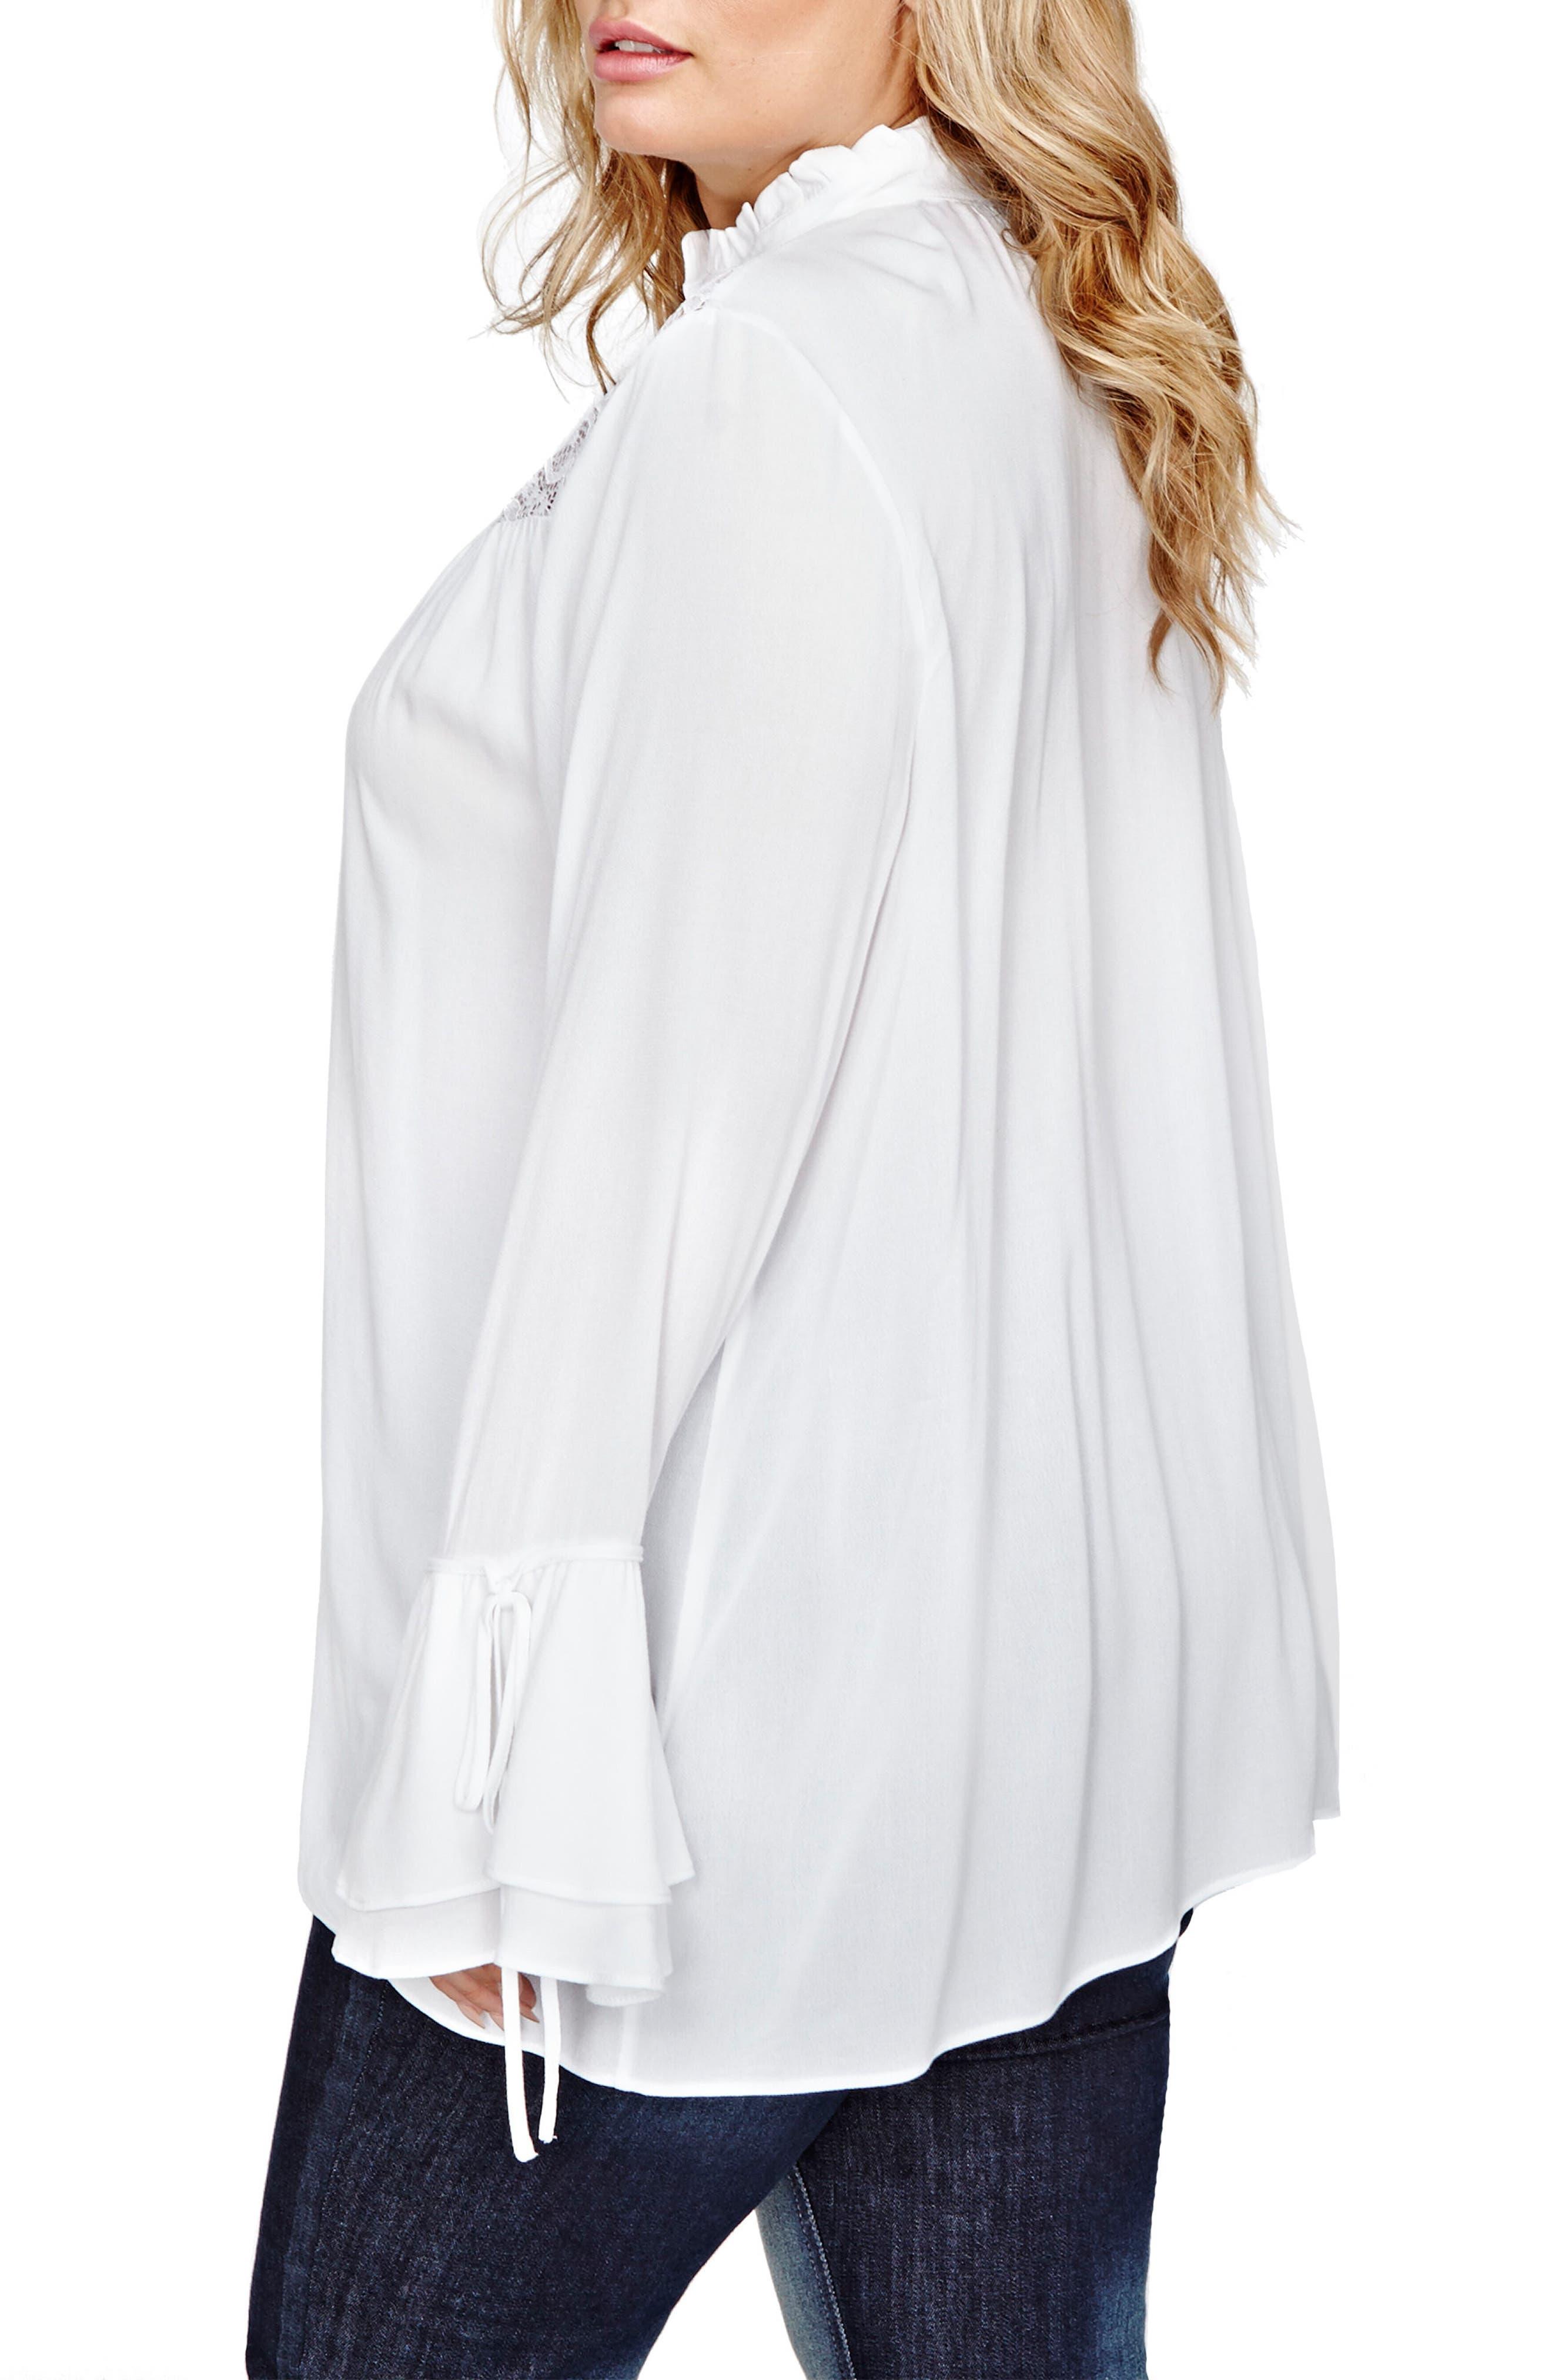 Alternate Image 2  - ADDITION ELLE LOVE AND LEGEND Jordyn Woods A-Line Lace Blouse (Plus Size)